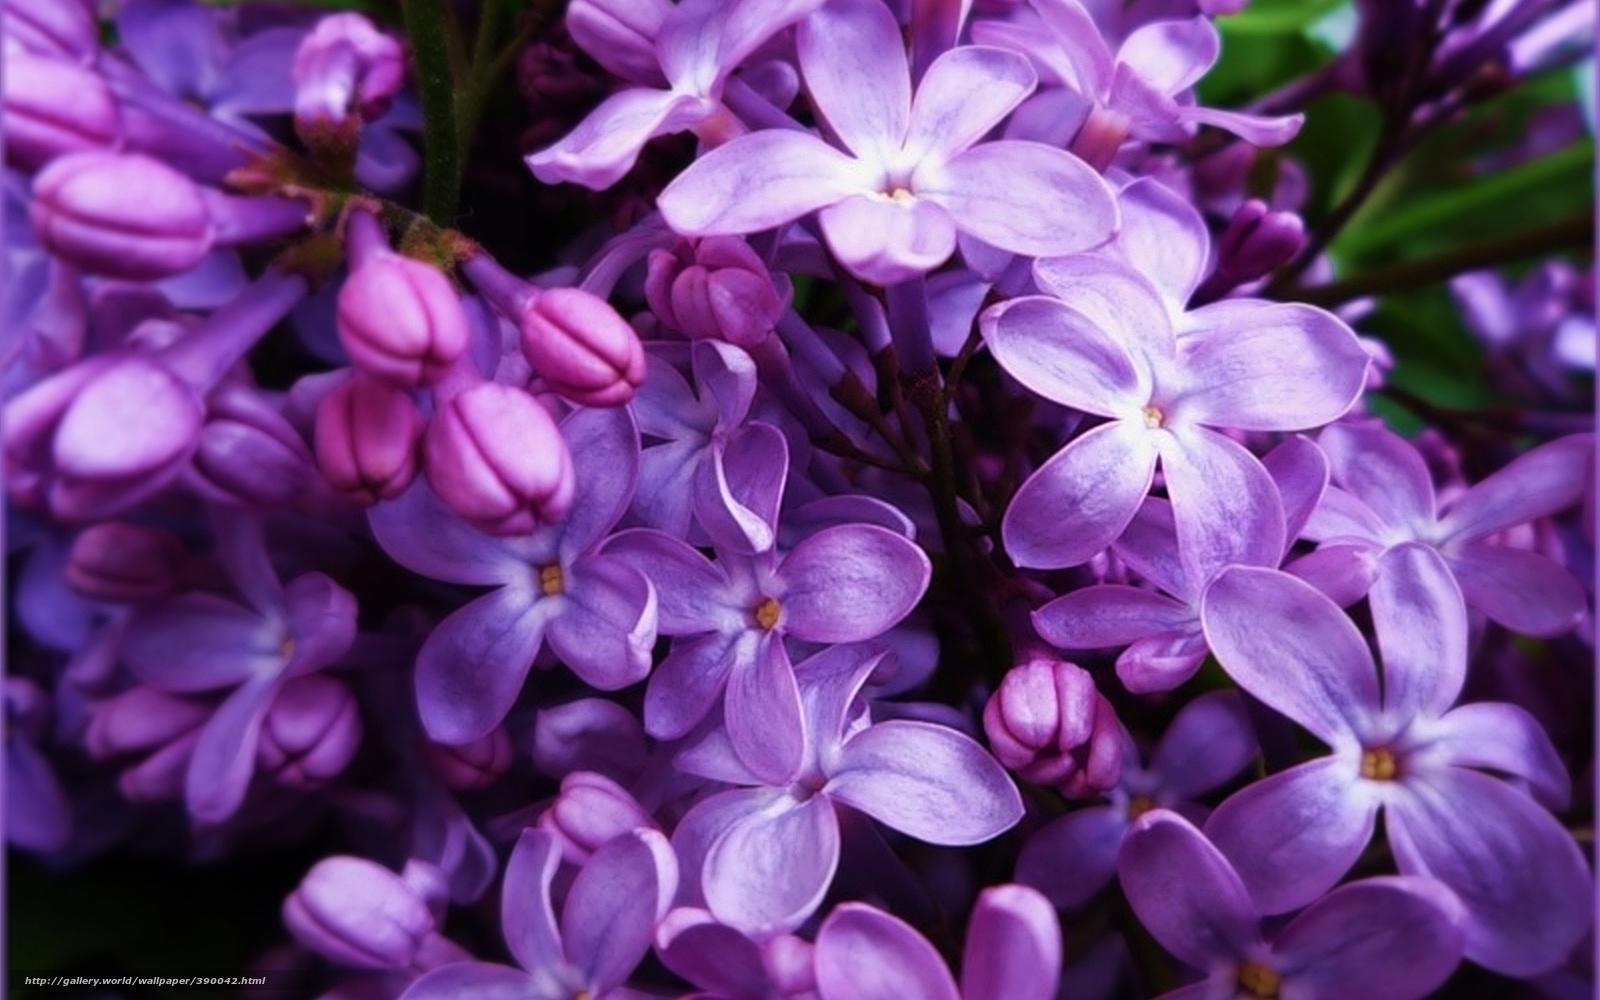 wallpaper Flowers lilac purple lilac desktop wallpaper 1600x1000